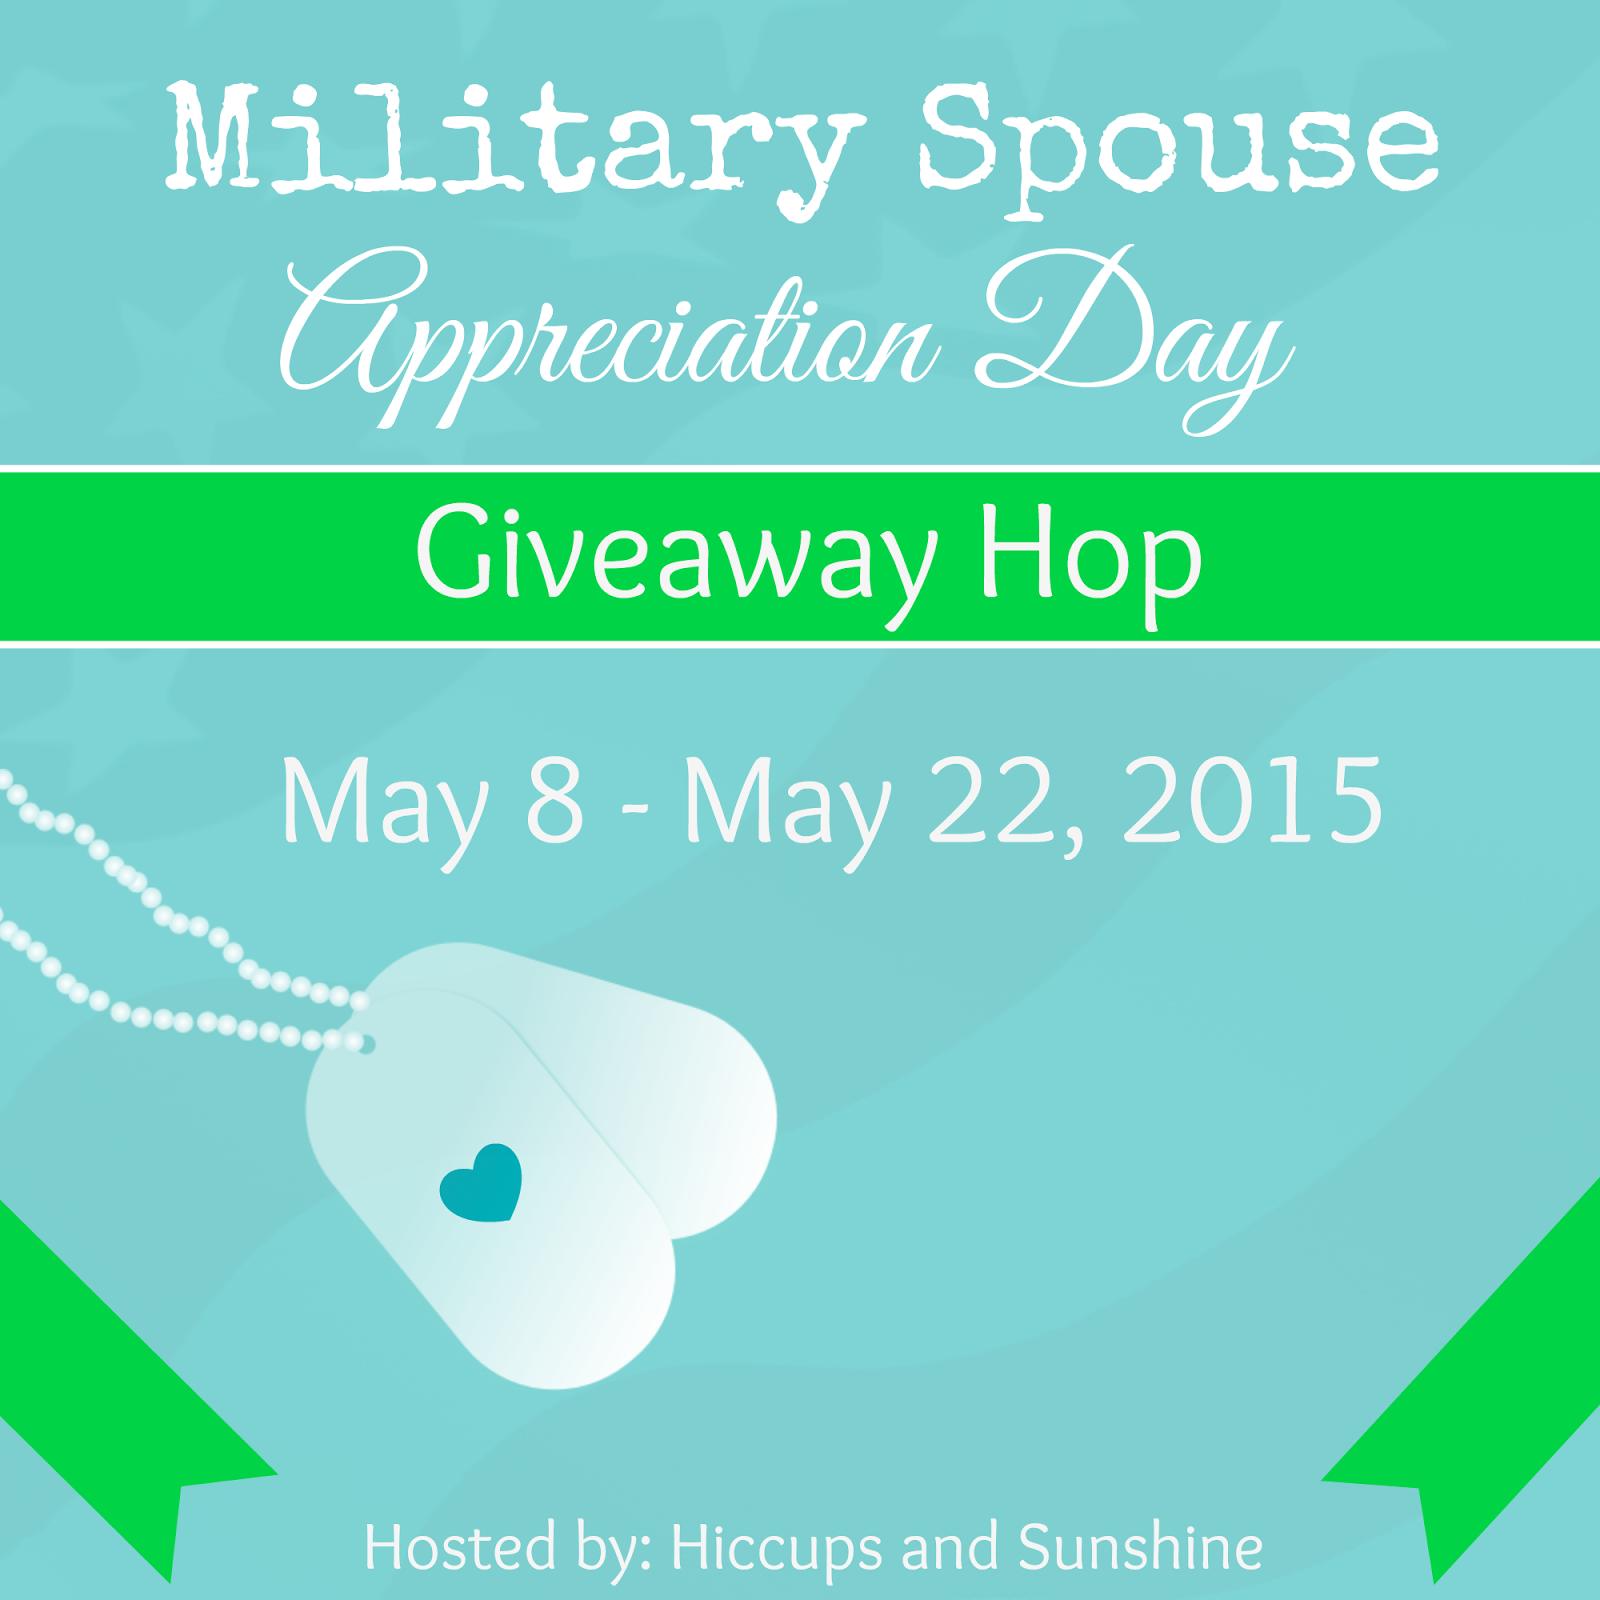 Military Spouse Appreciation